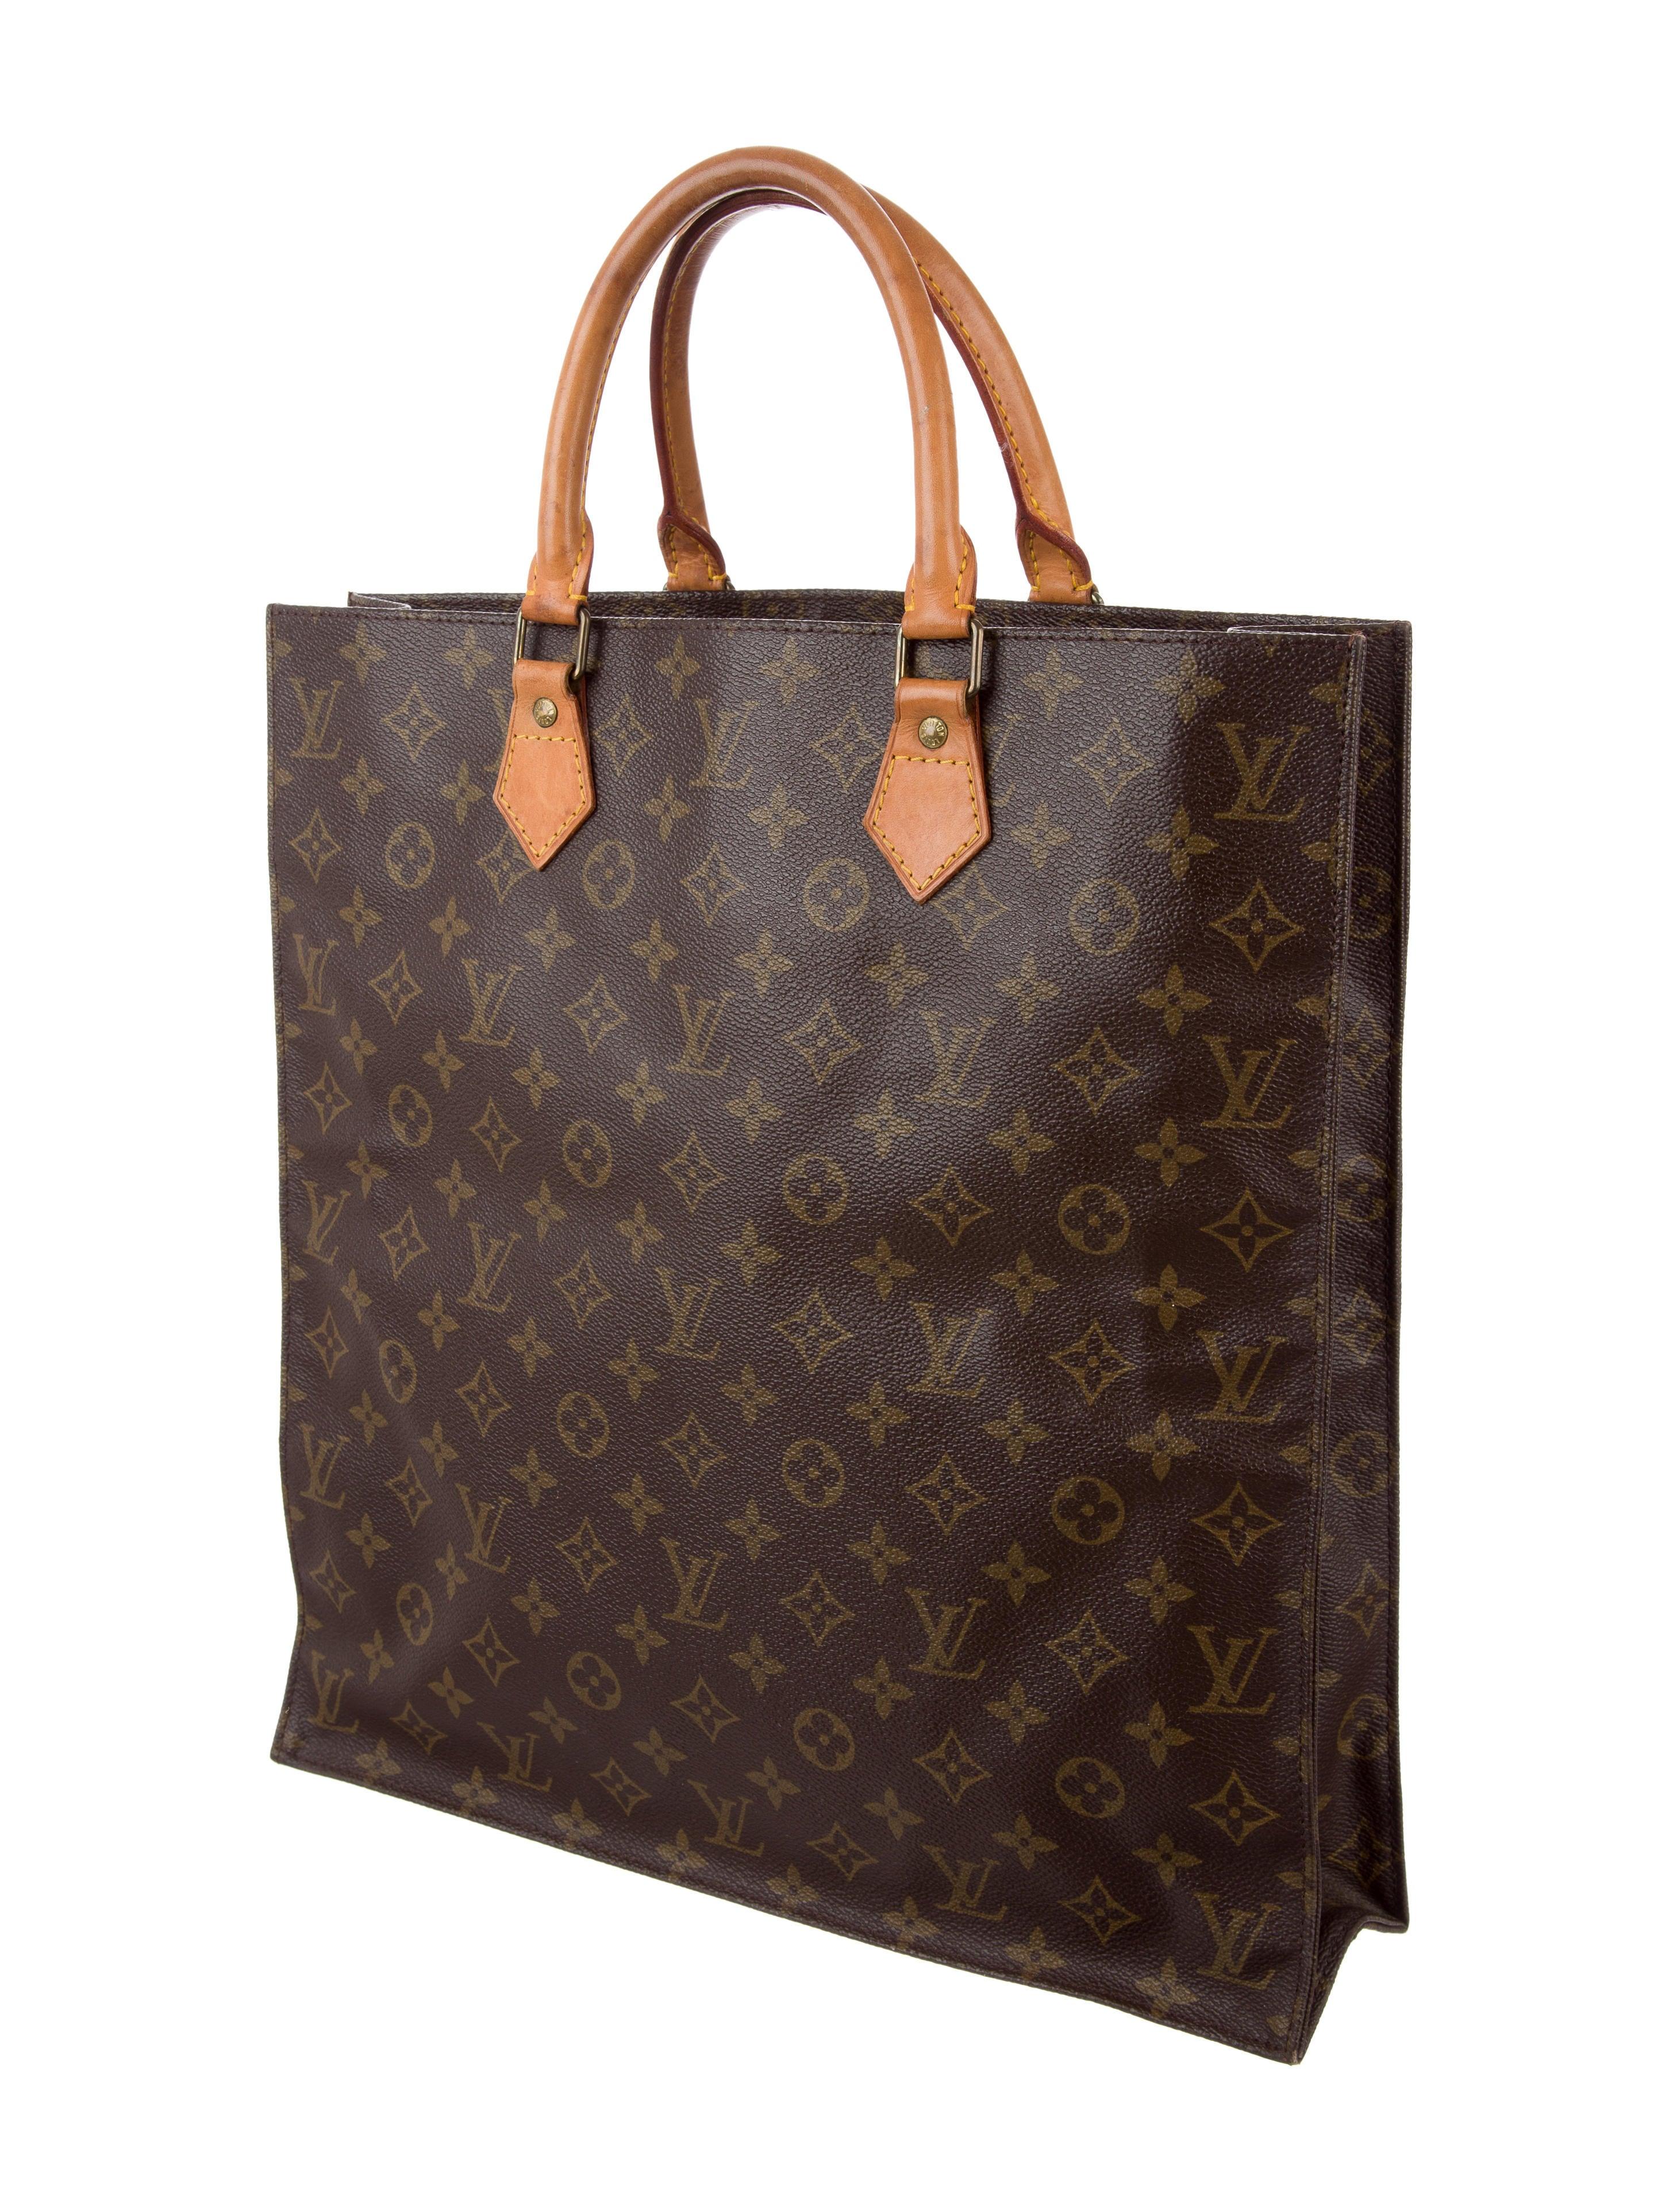 f46a82b495dbc Louis Vuitton Monogram Sac Plat - Handbags - LOU130673